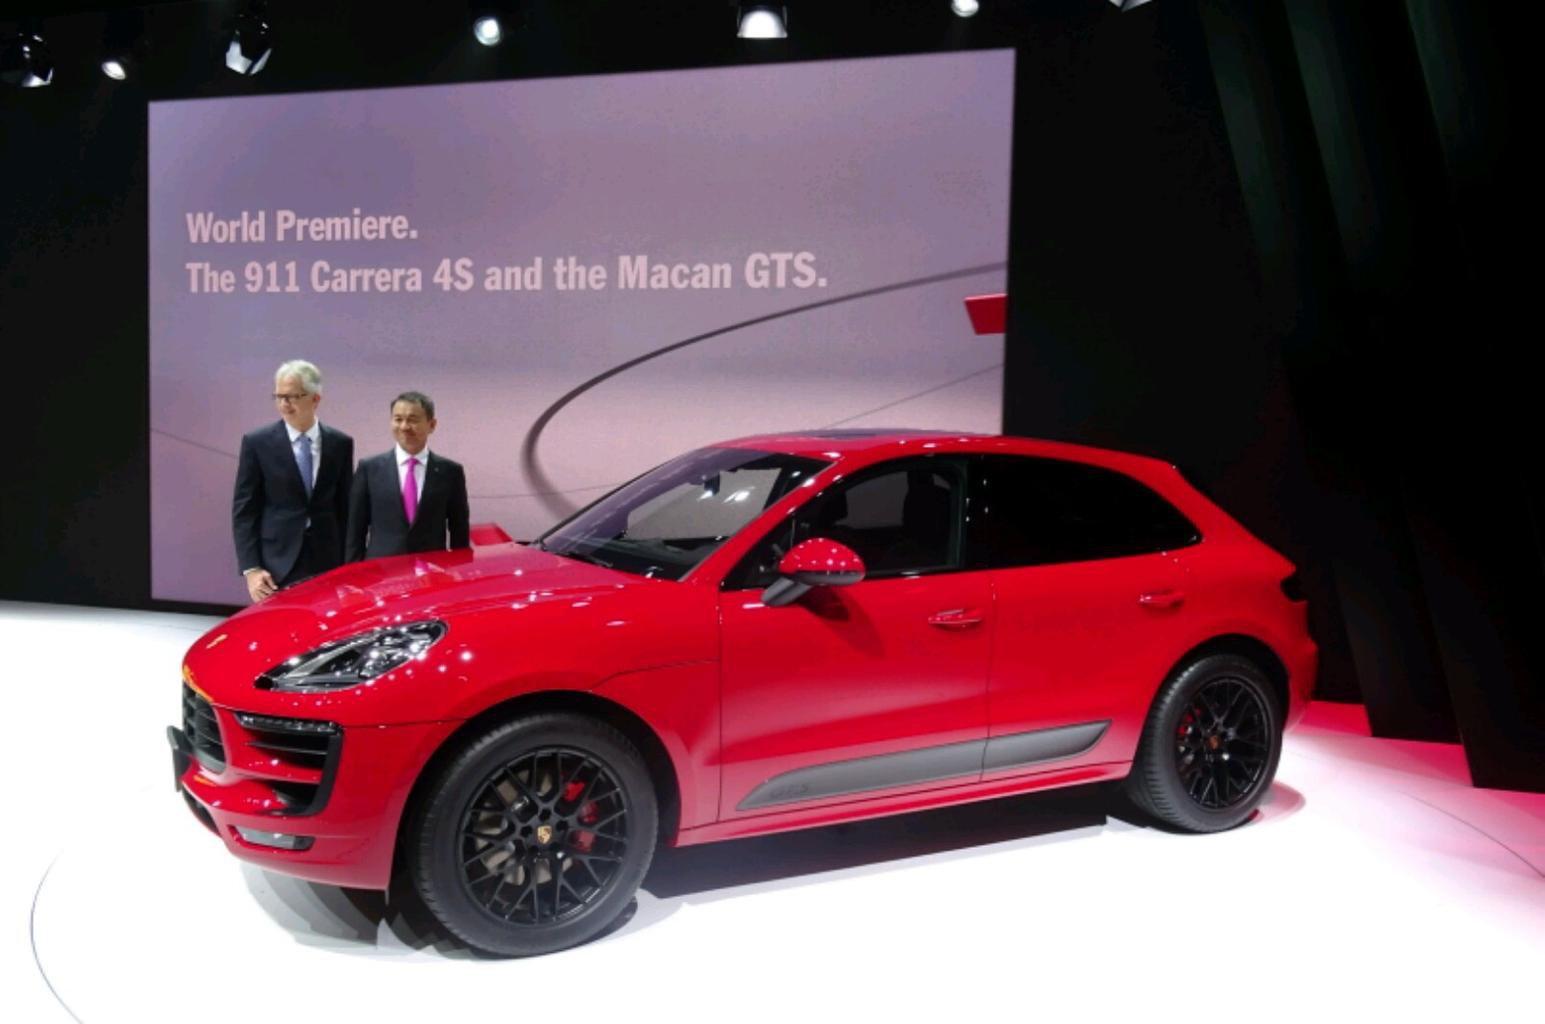 2016 Porsche Macan GTS revealed